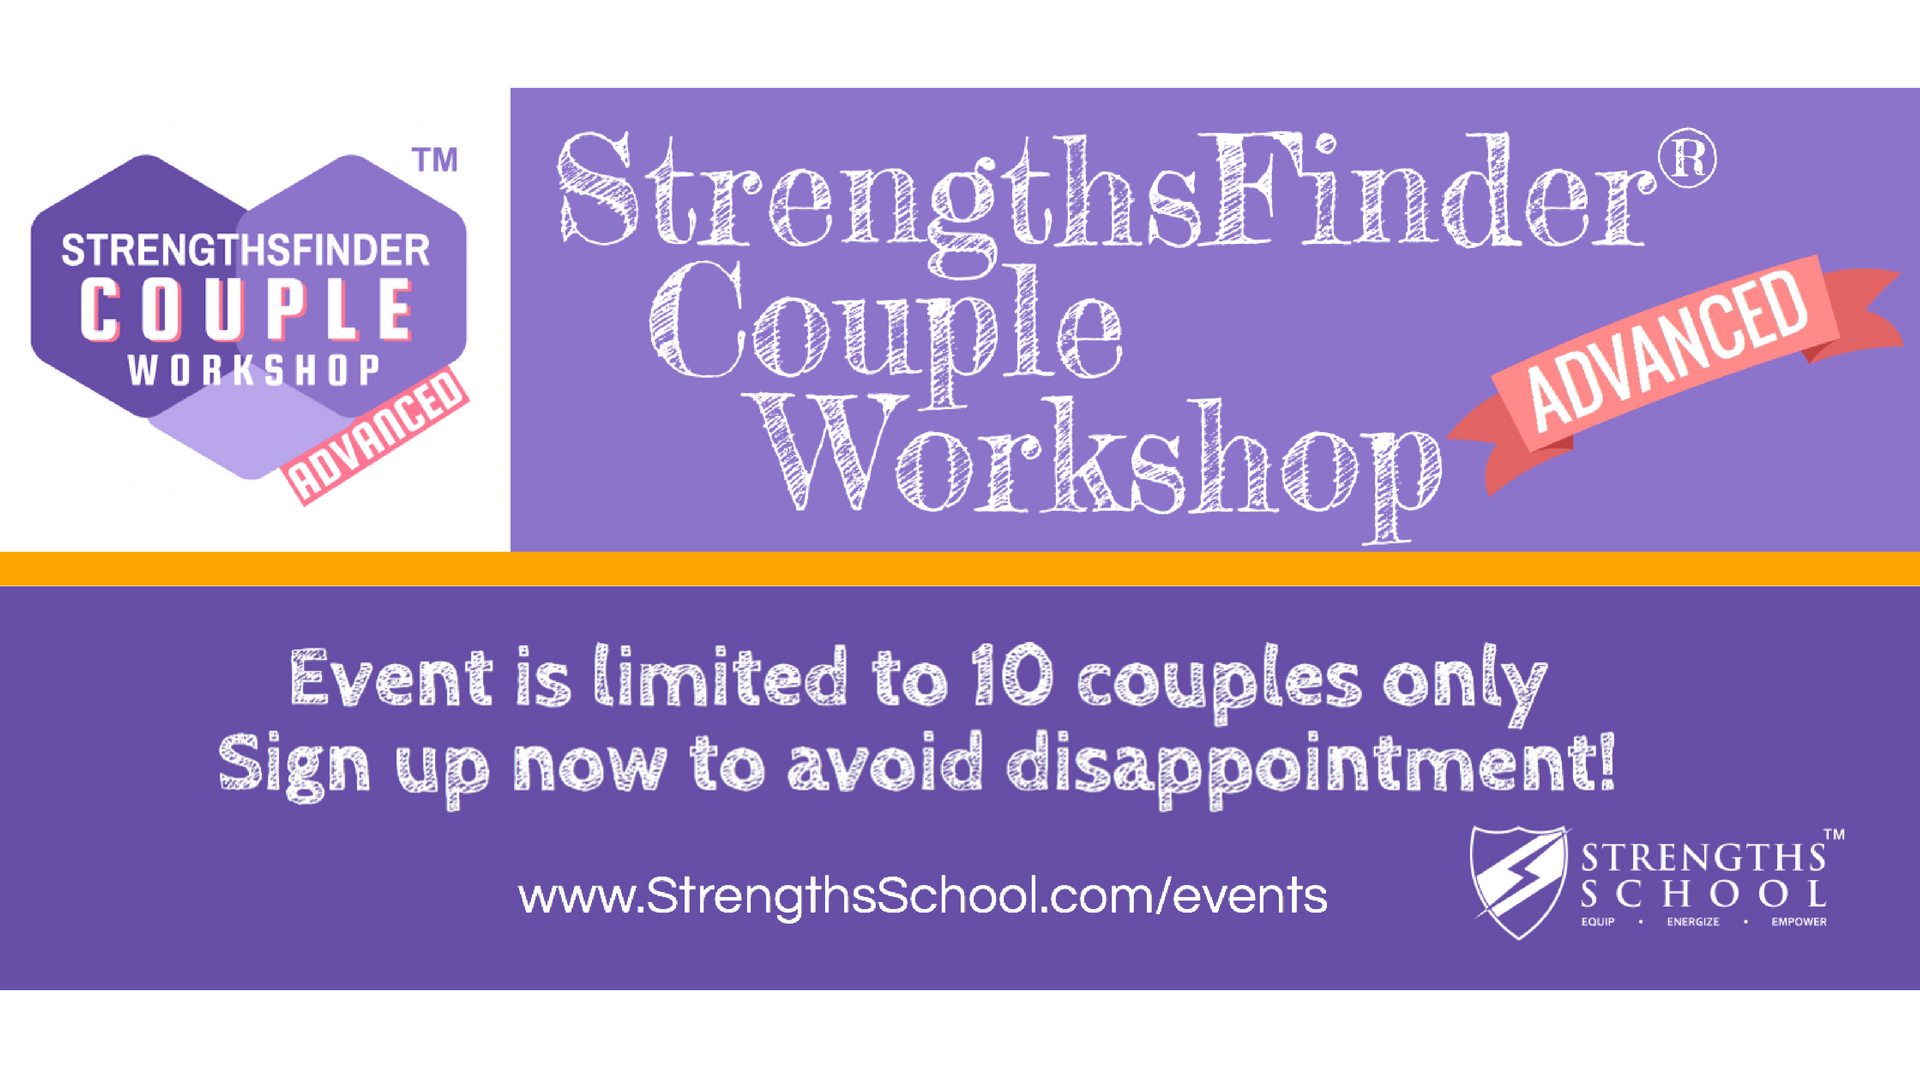 StrengthsFinder Couple Workshop - Advanced  Banner-2